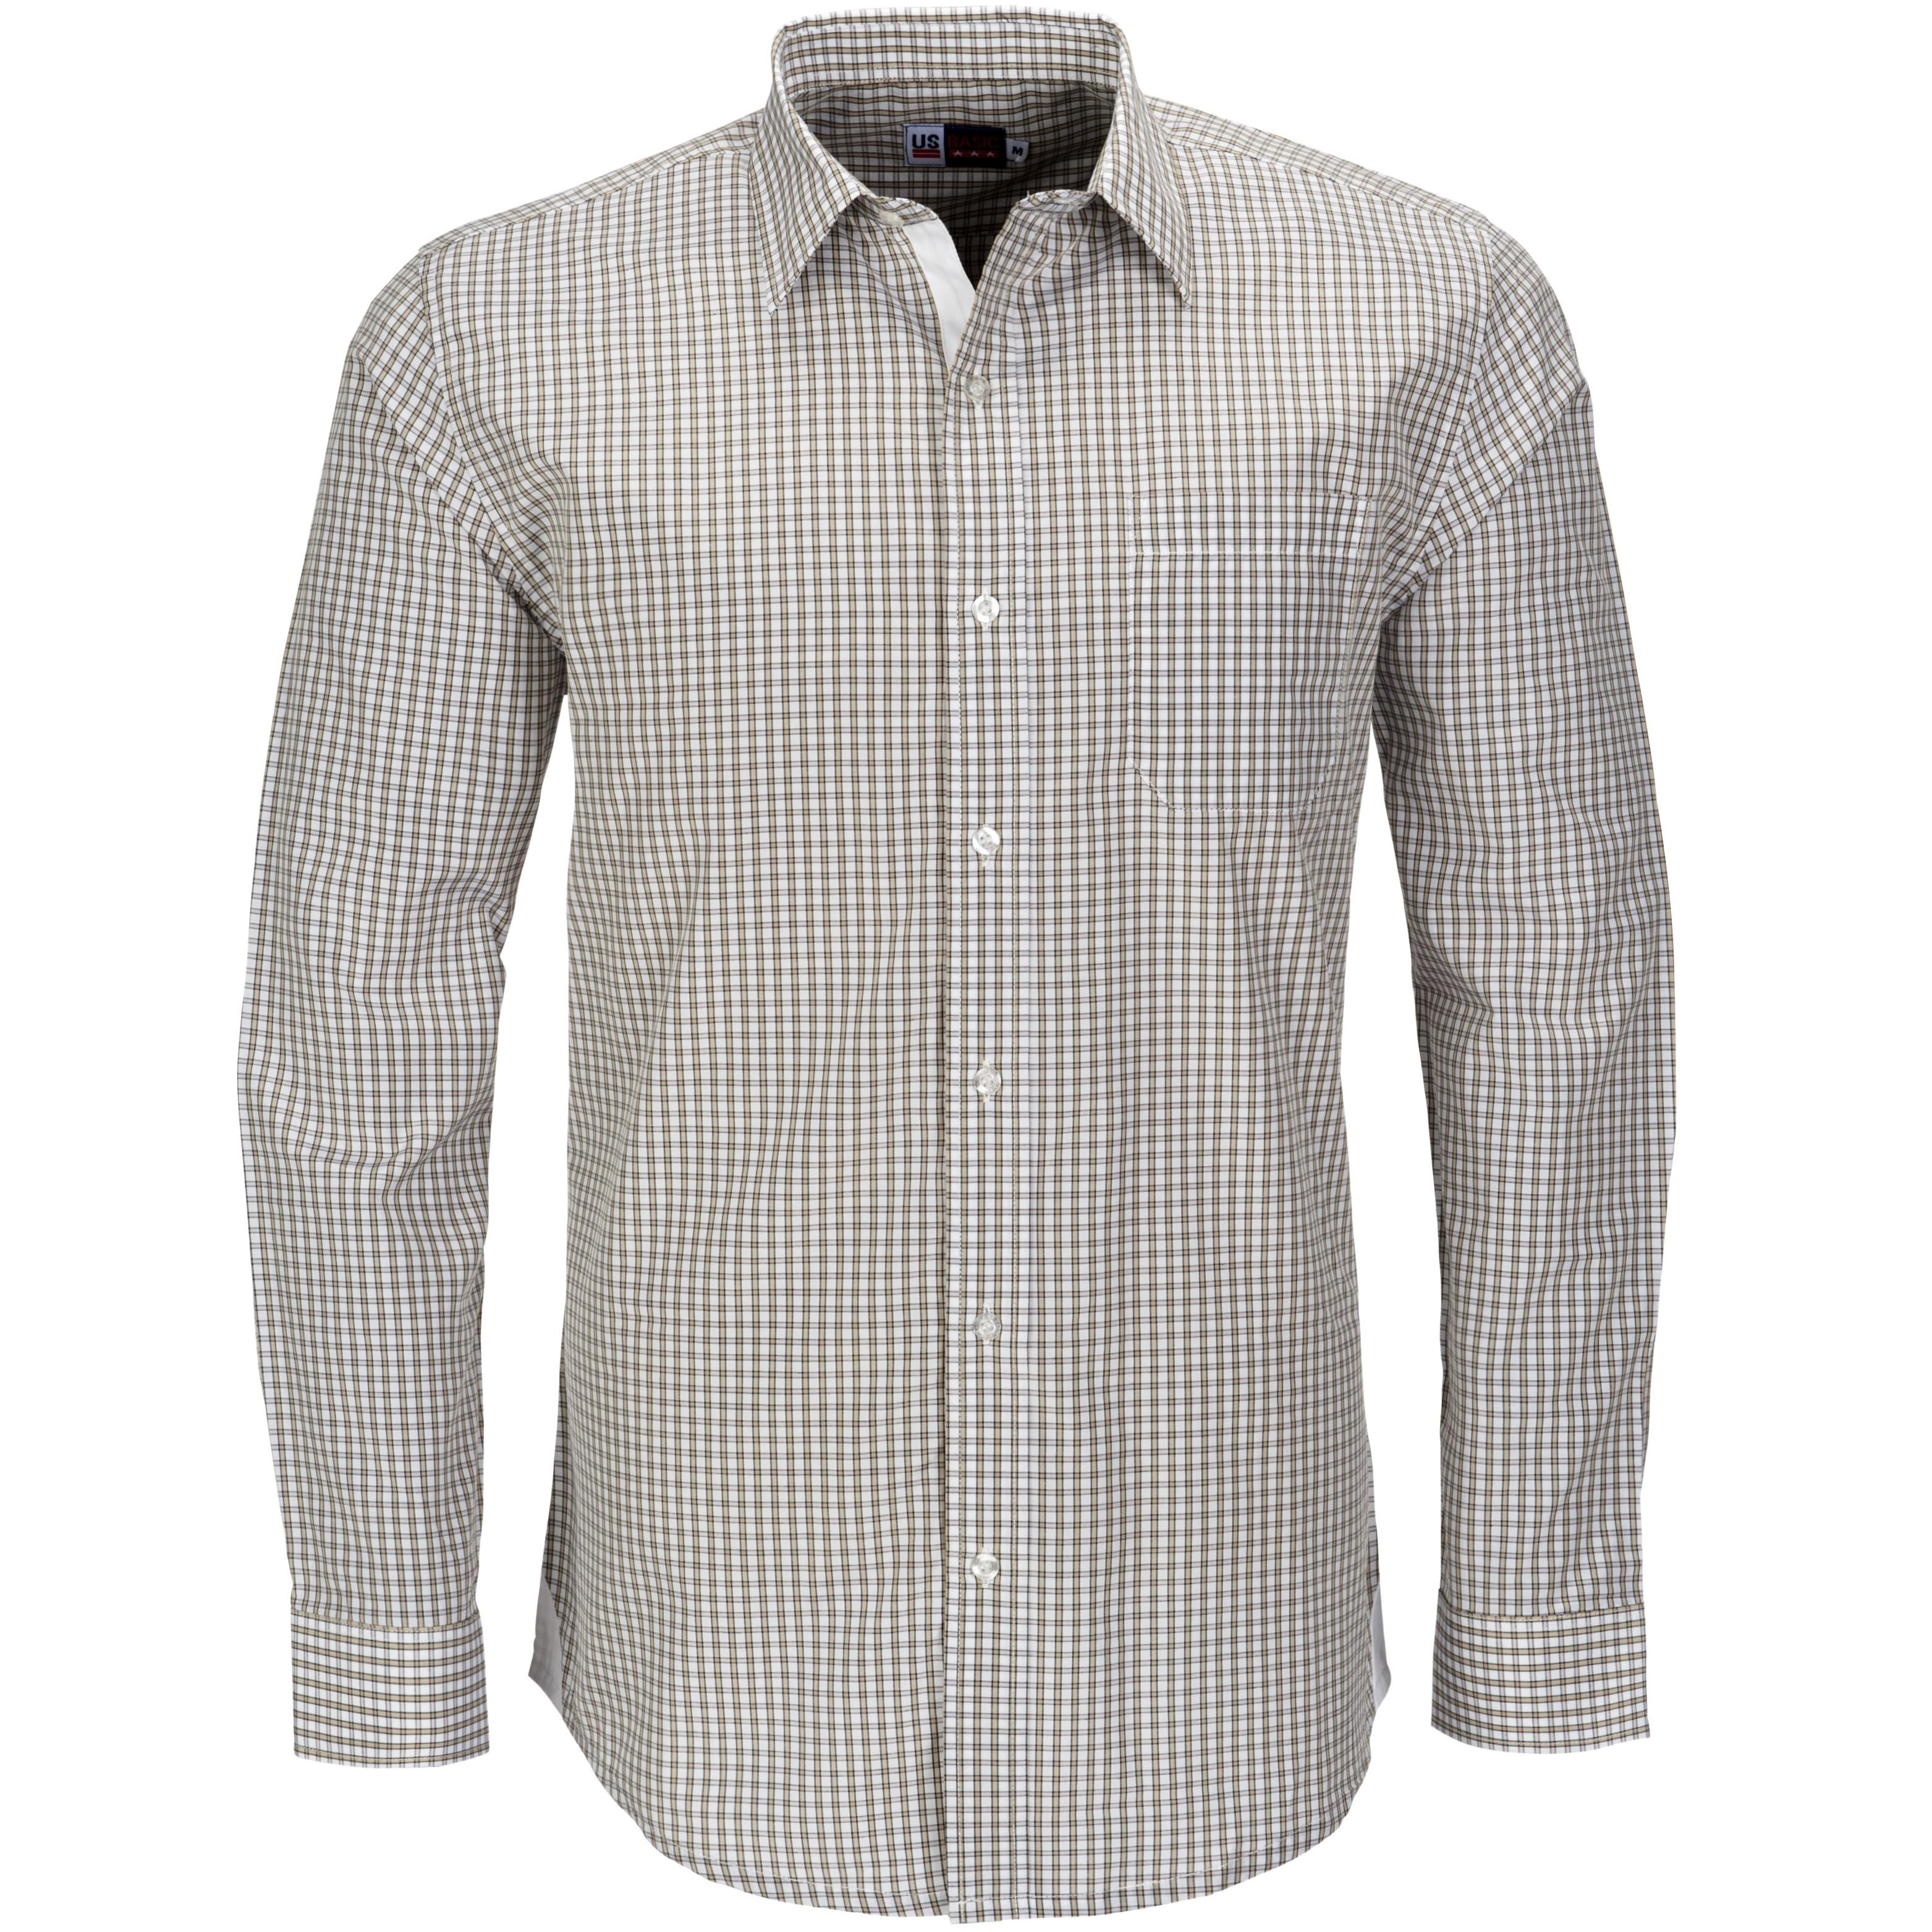 Mens Long Sleeve Kenton Shirt - Khaki Only